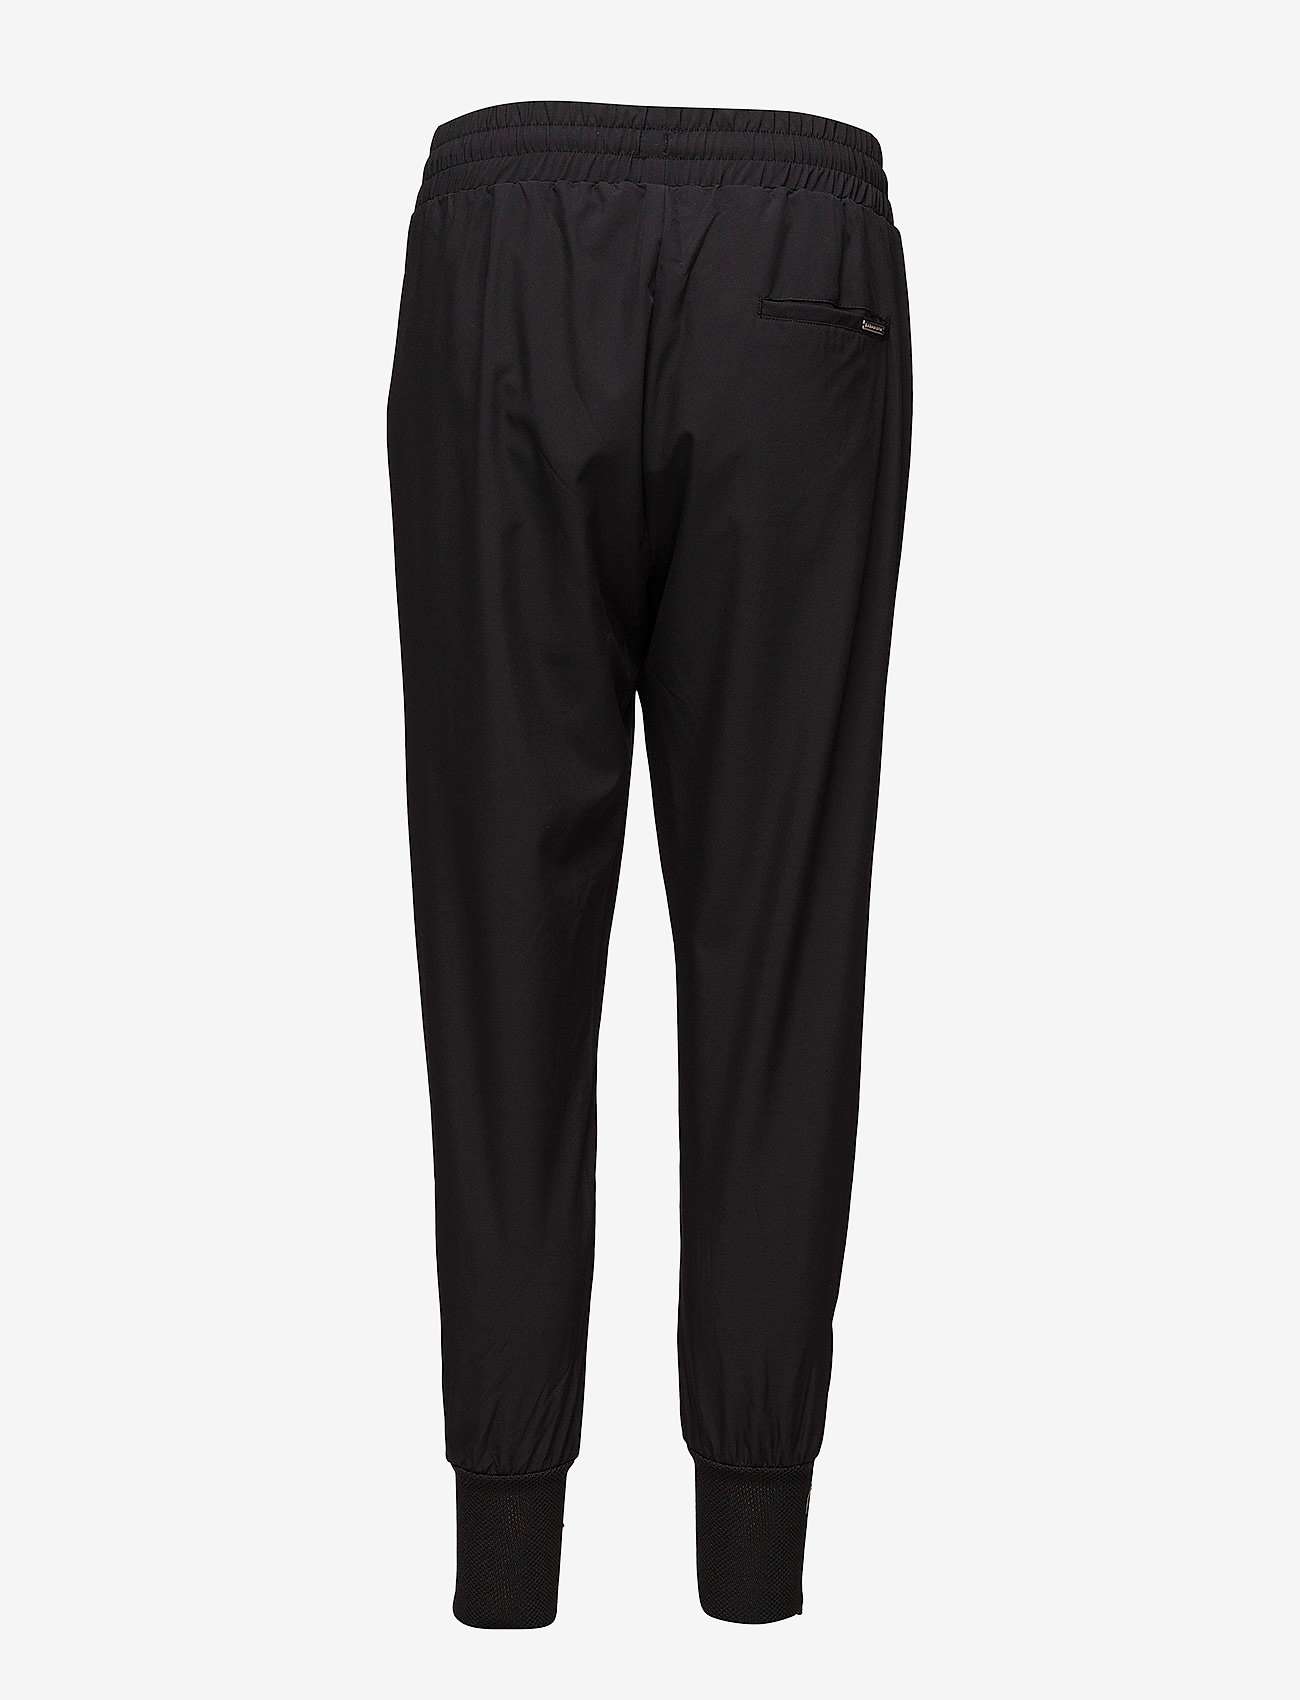 Röhnisch - Comfort Pants - pants - black - 1